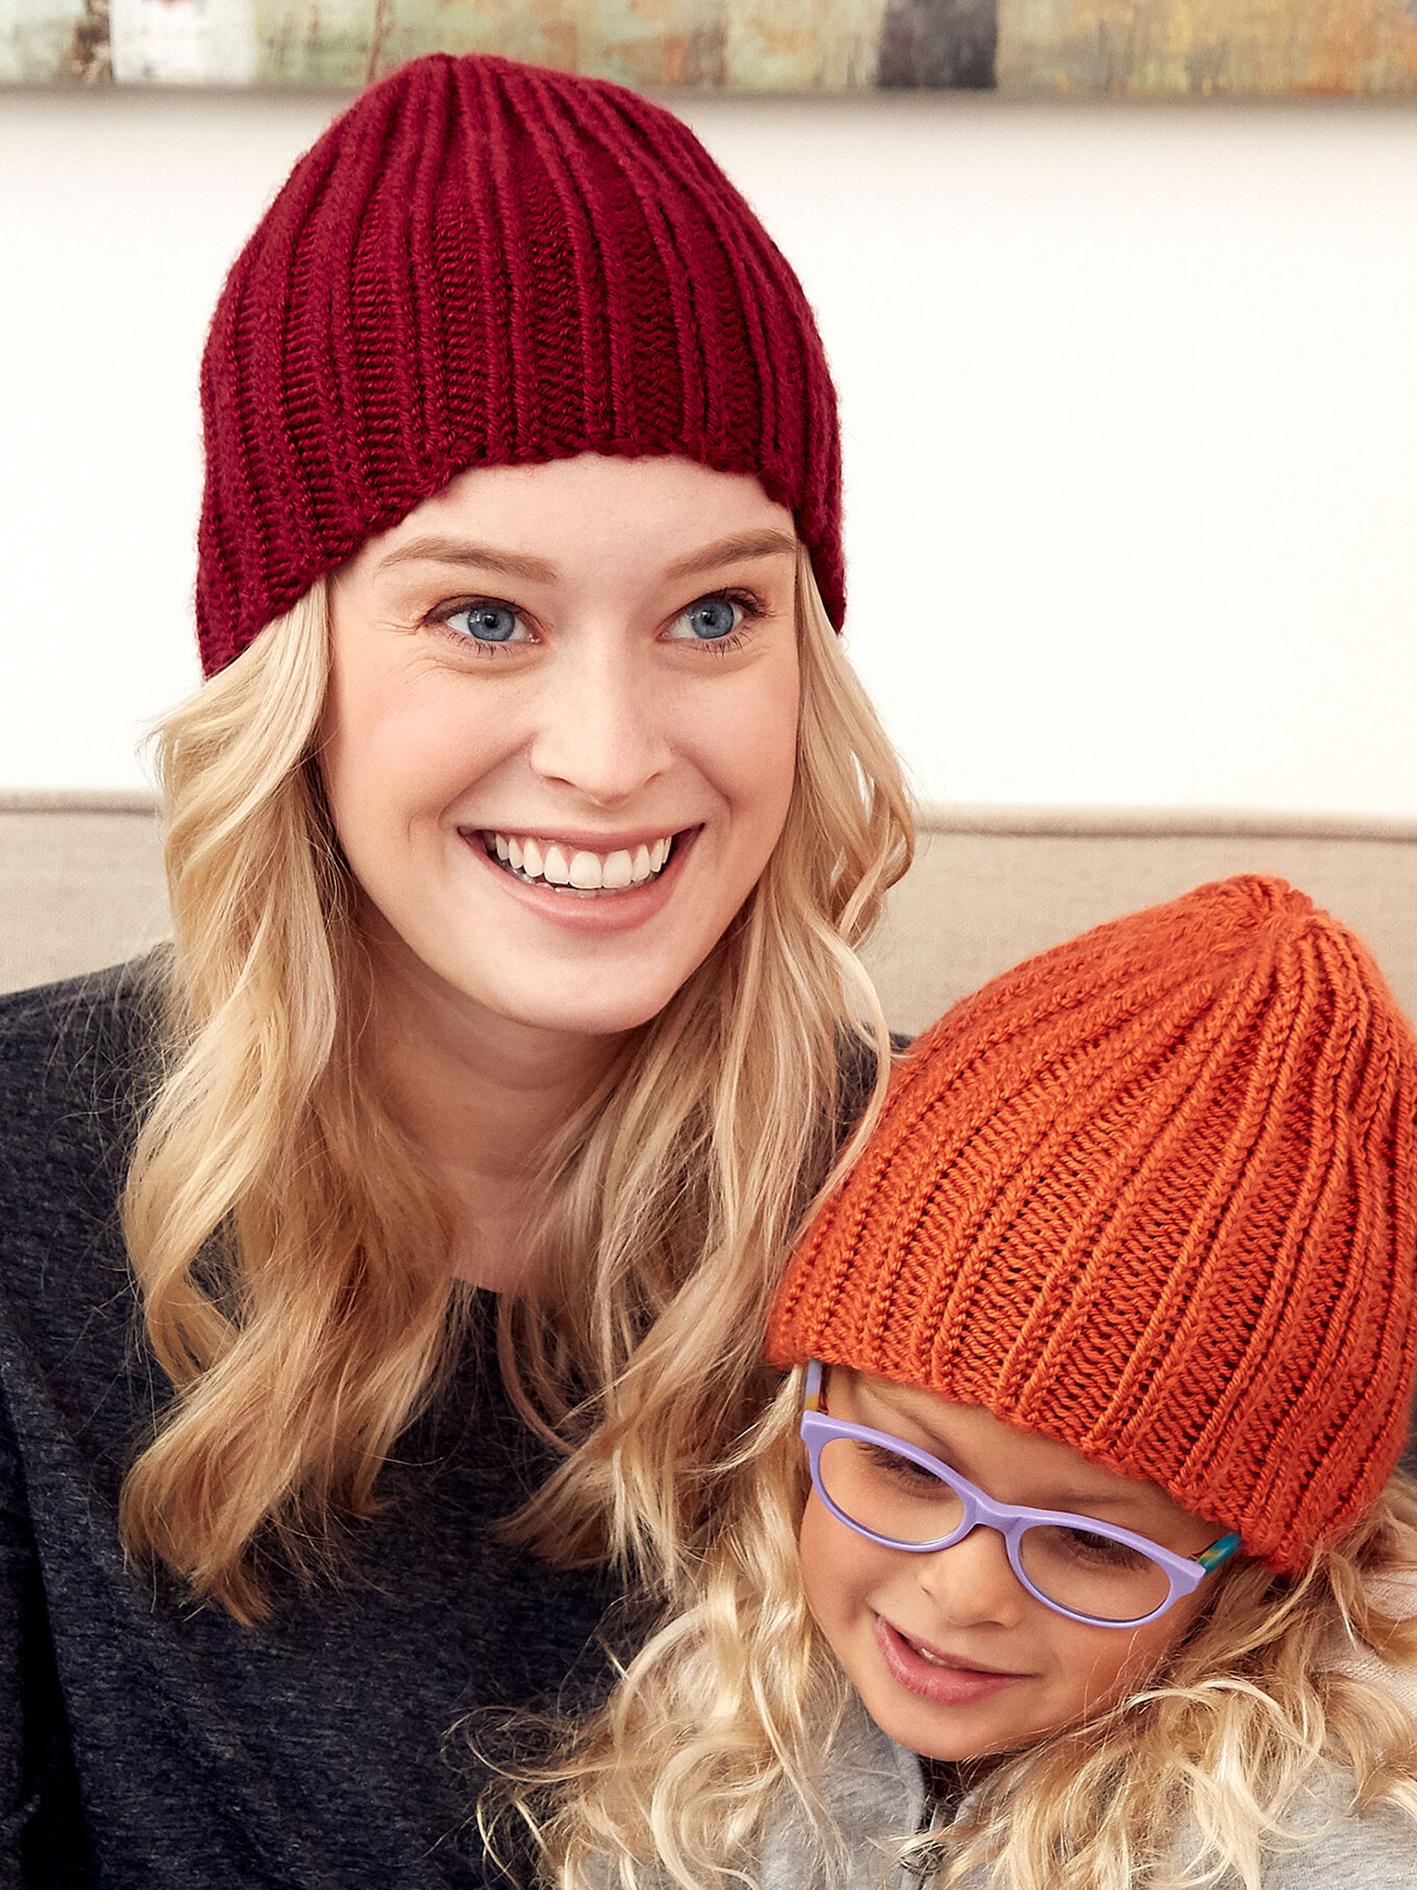 crochet-beanie-pattern-30-new-idea-colorful-earflap-hat-life